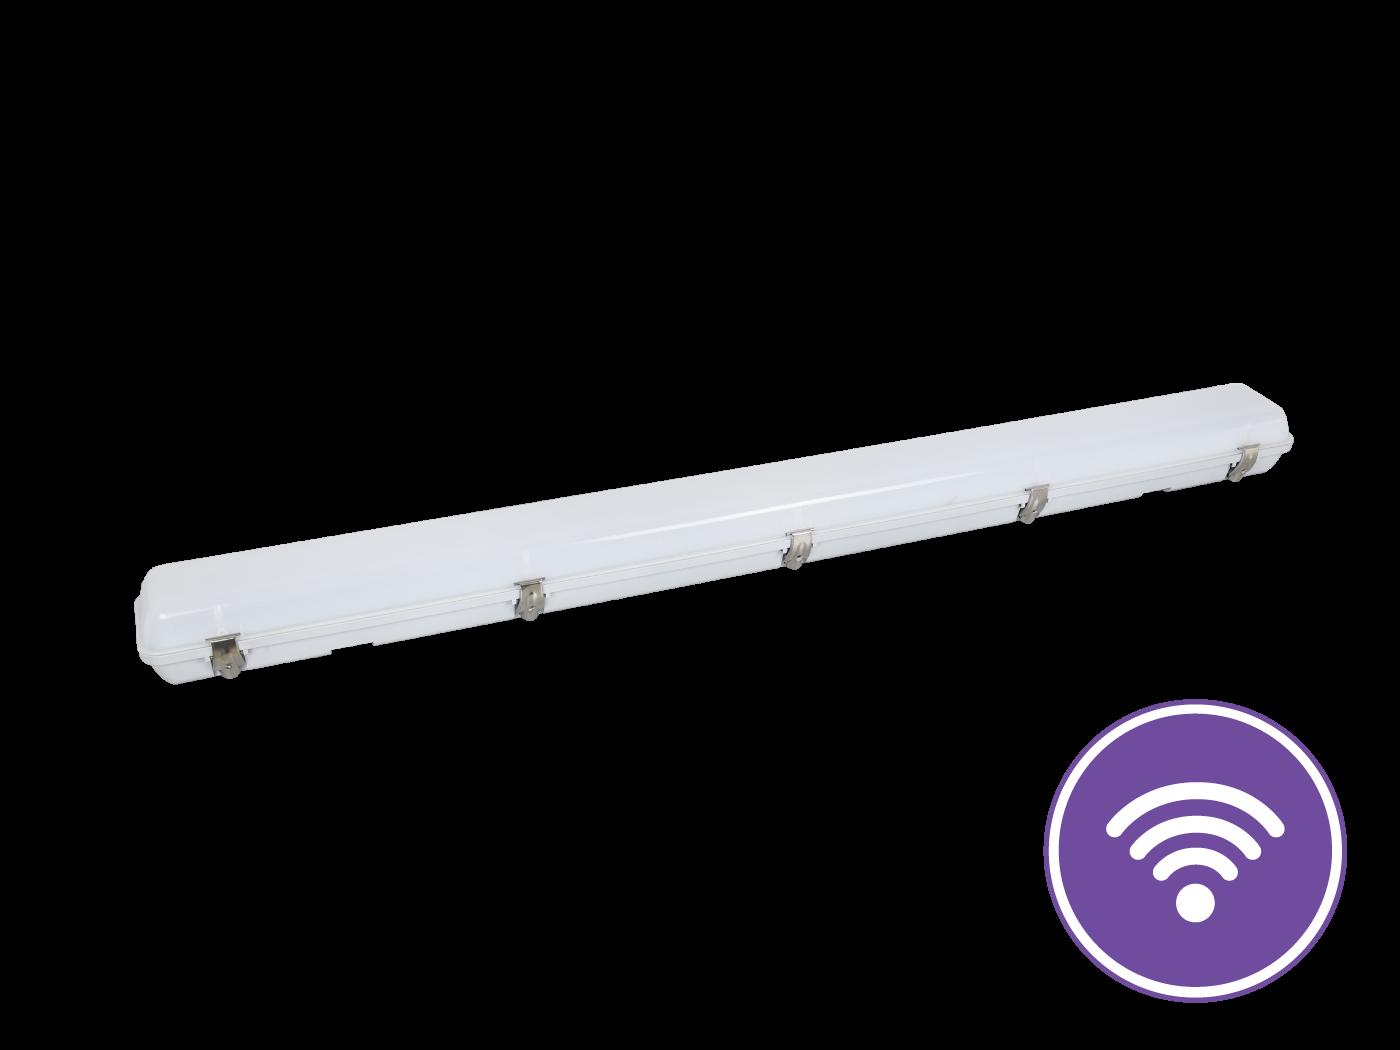 Tempest V IP65 Sensor Batten 4FT